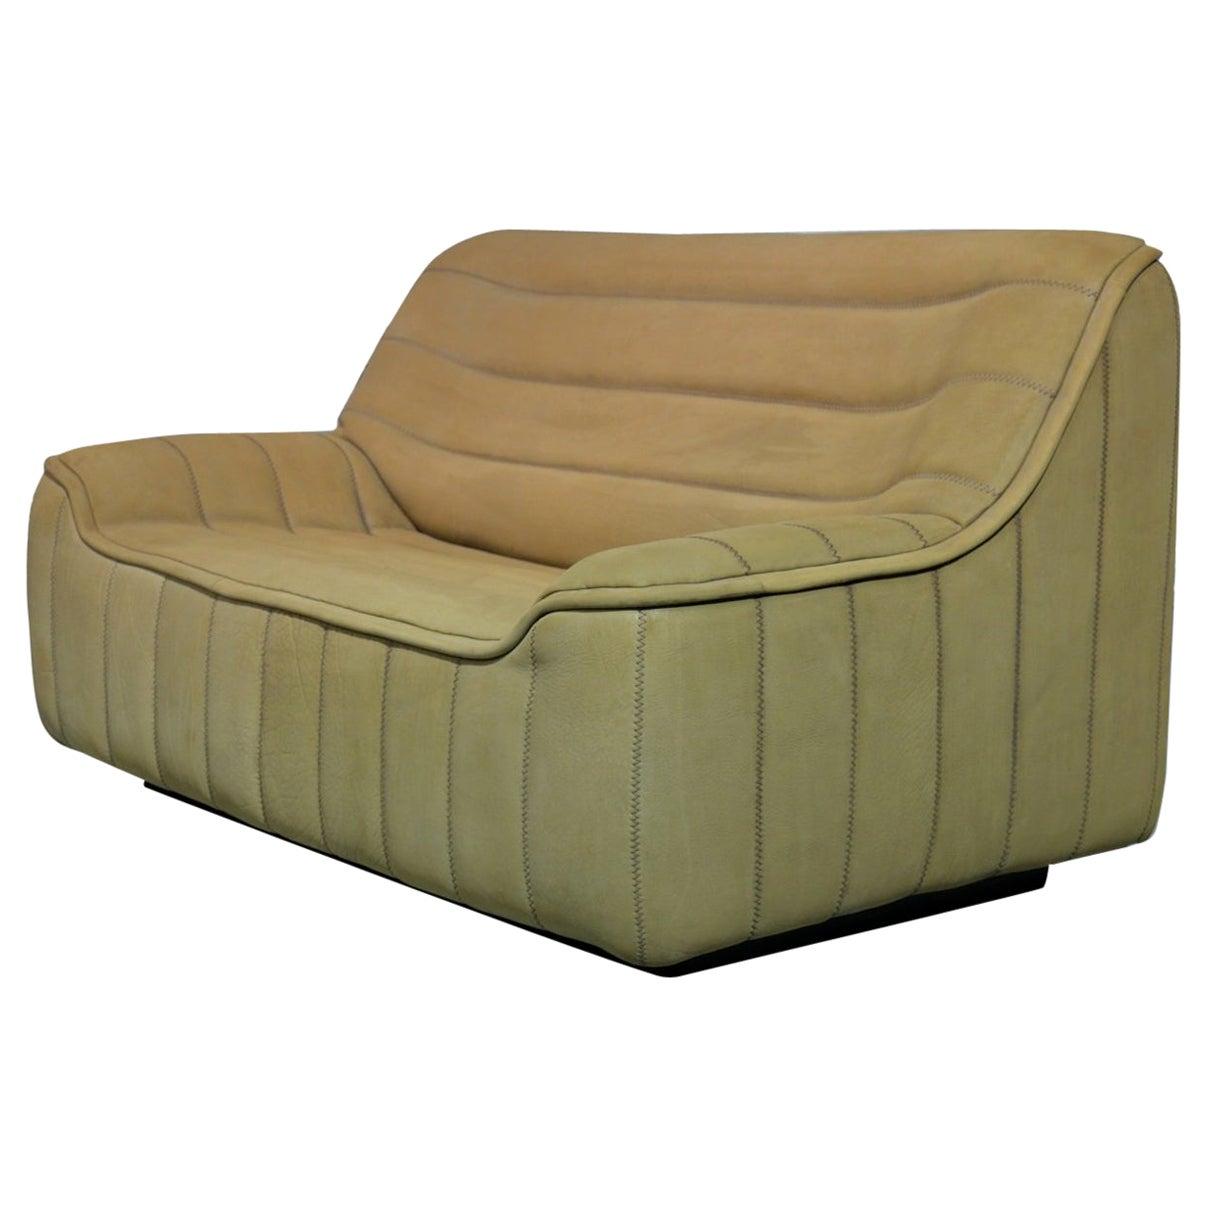 Vintage De Sede DS 84 Leather Sofa, Switzerland 1970s